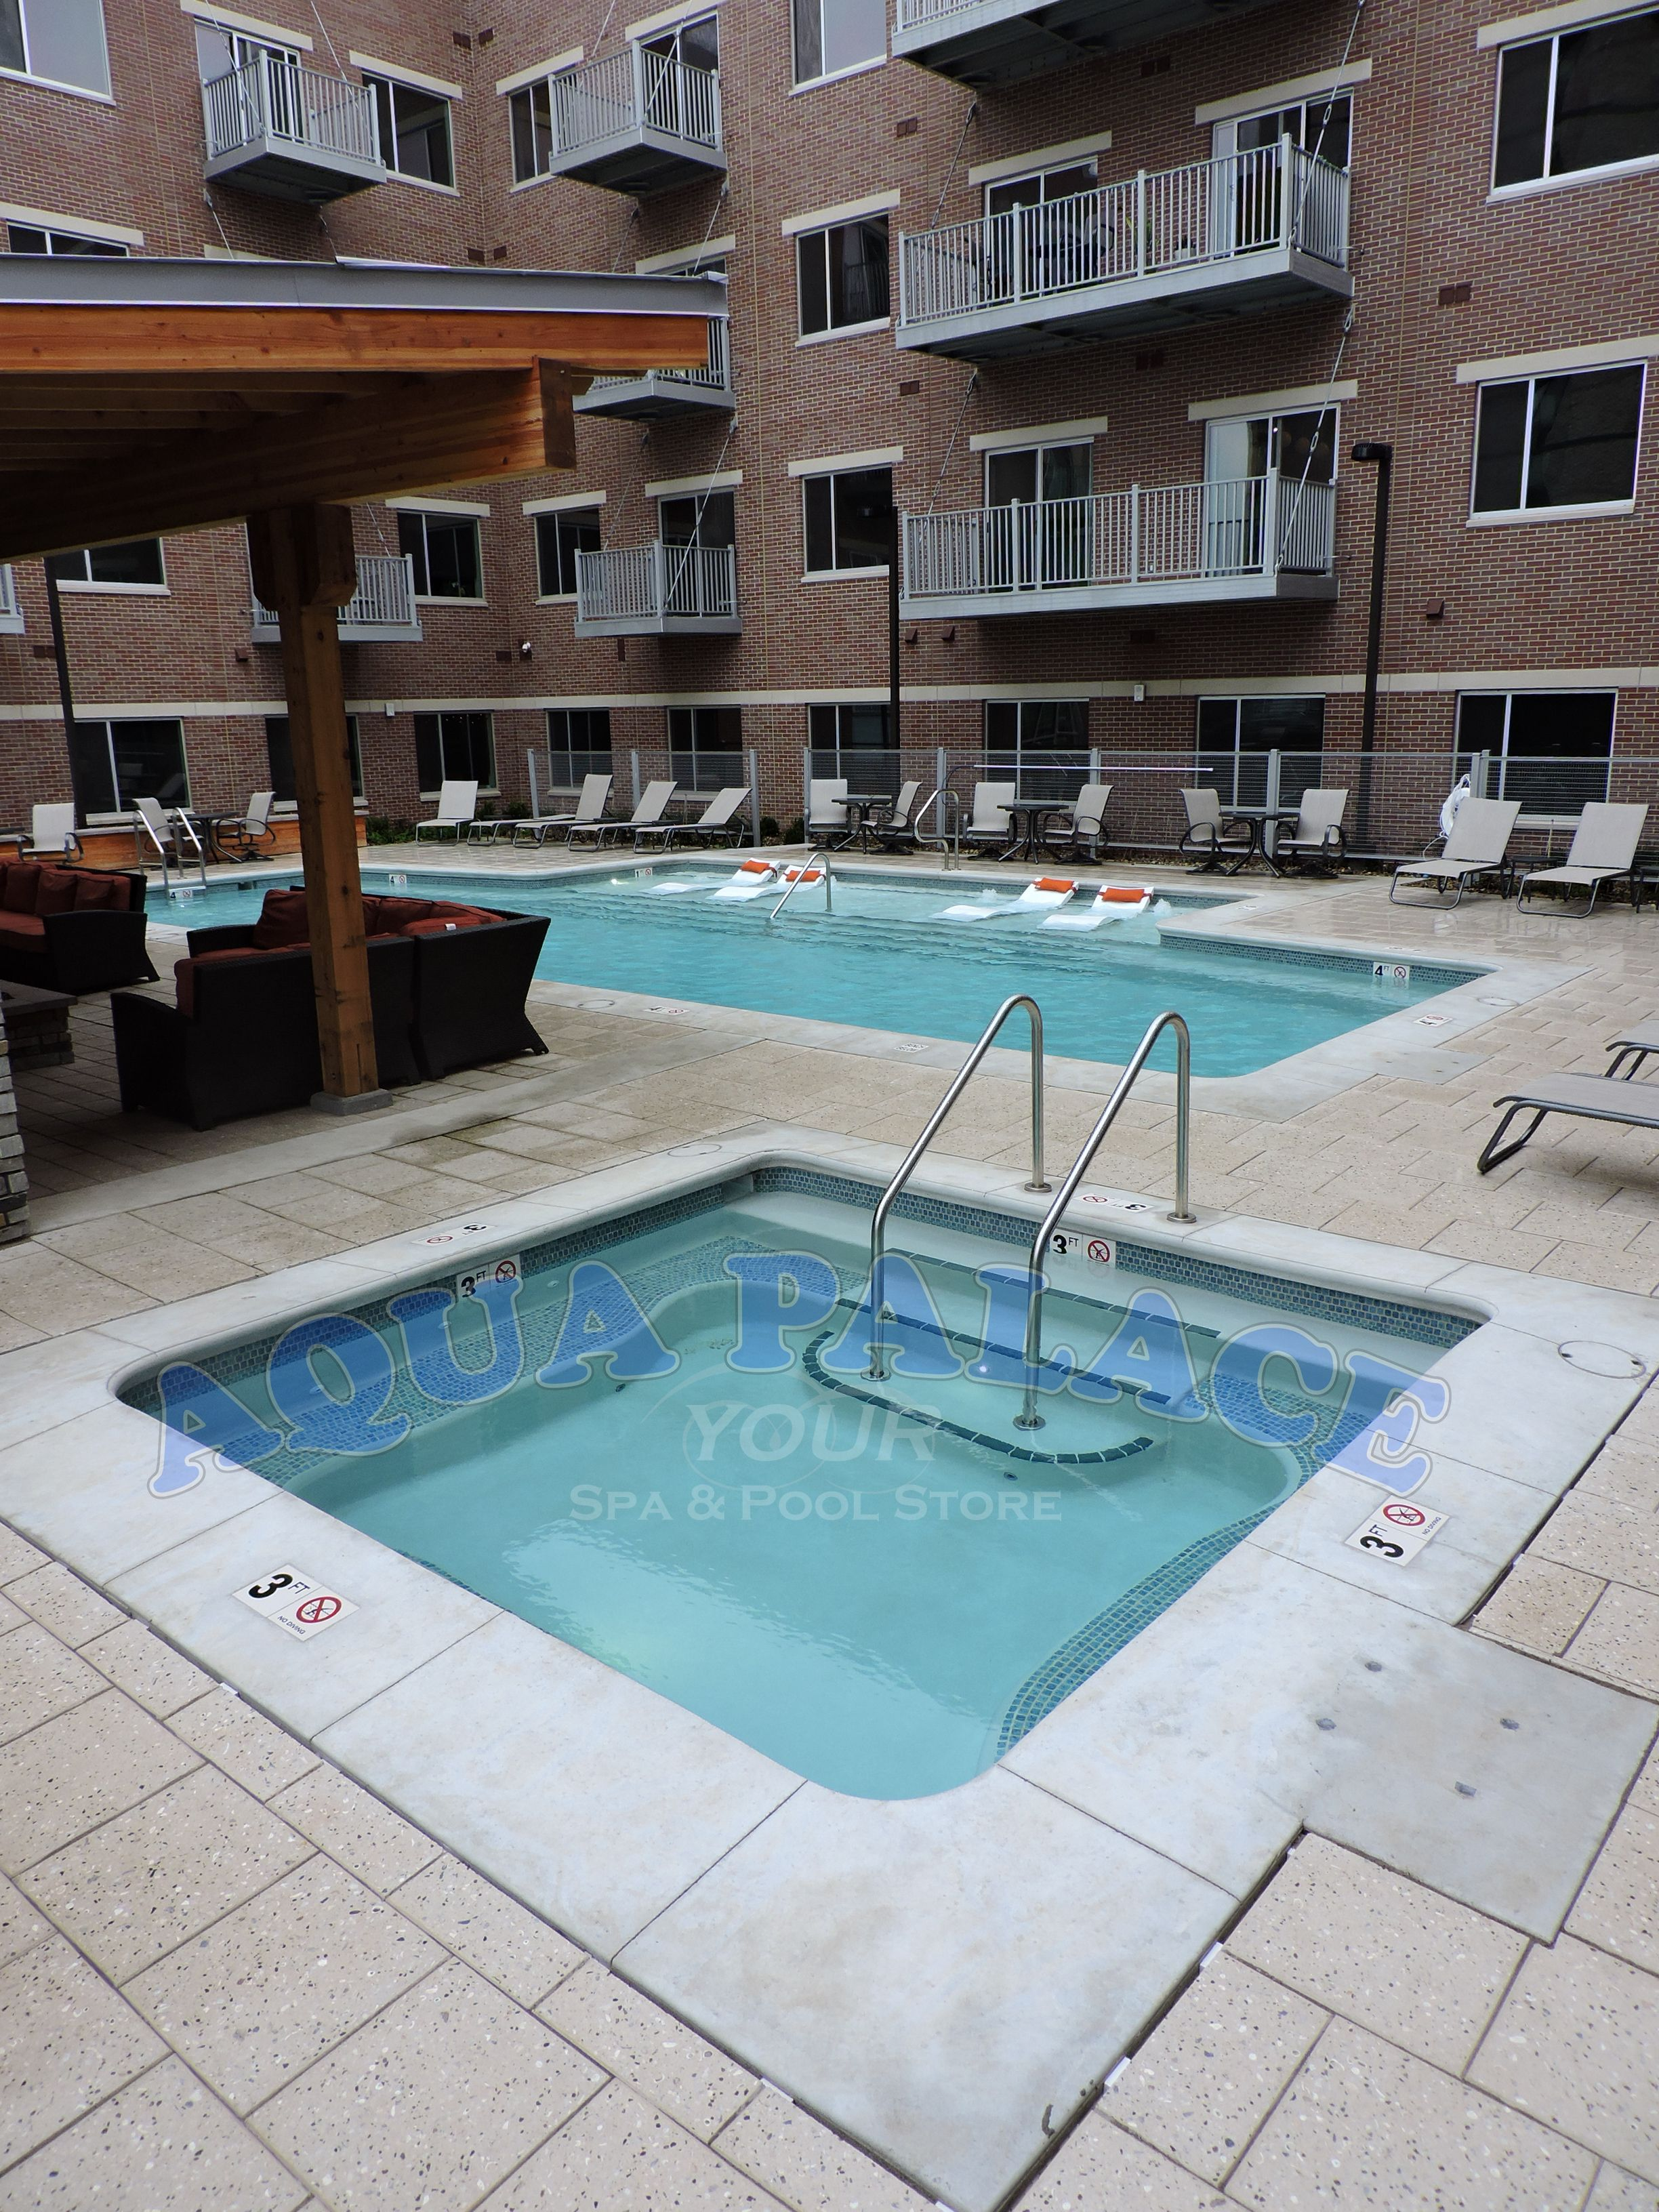 Custom Gunite Swimming Pool In Downtown Omaha Ne Apartment Complex With Gunite Custom Spa Spa